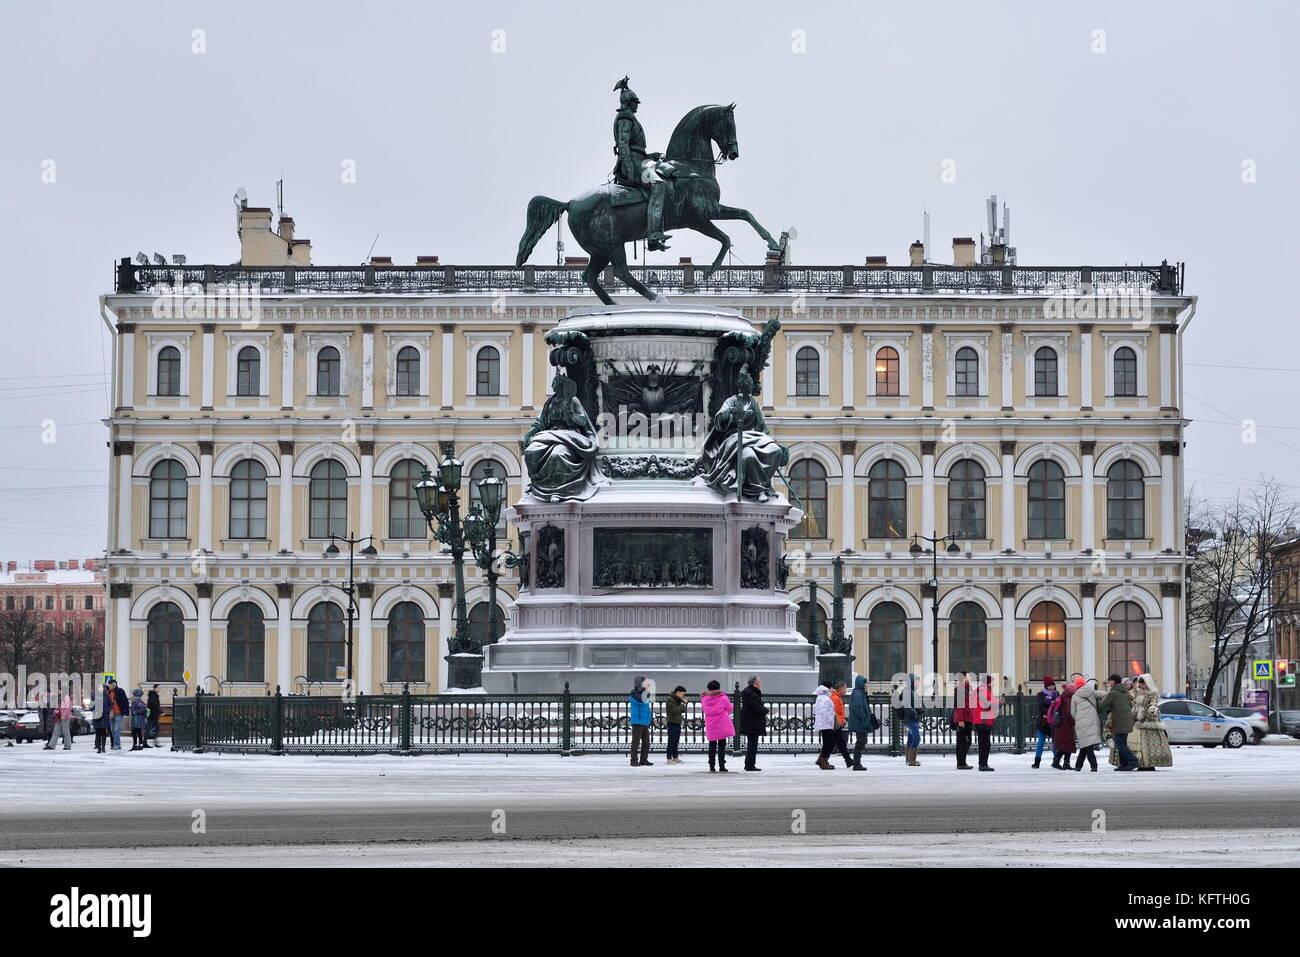 St Petersburg Russia January 12 Stockfotos & St Petersburg Russia ...